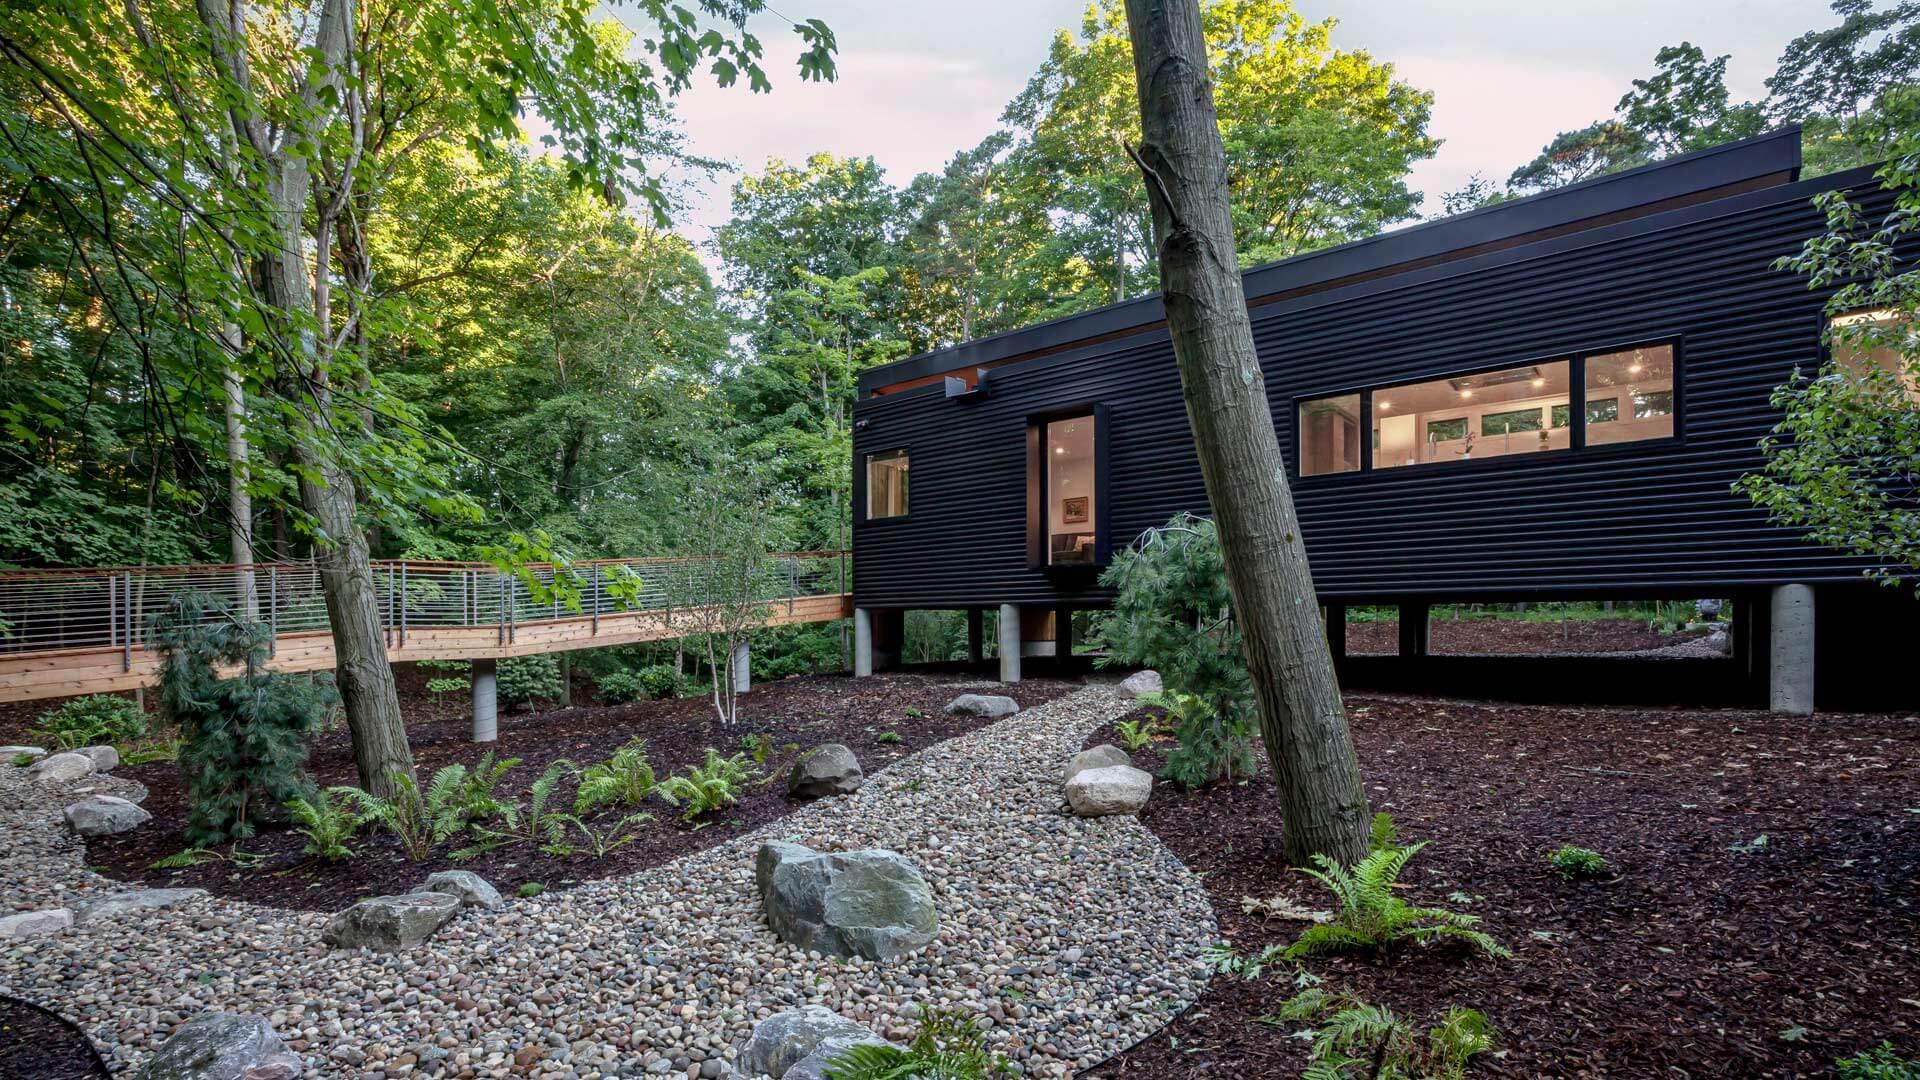 South Entry Garden - Bridge House - Fenneville, Michigan - Lake Michigan - HAUS | Architecture For Modern Lifestyles